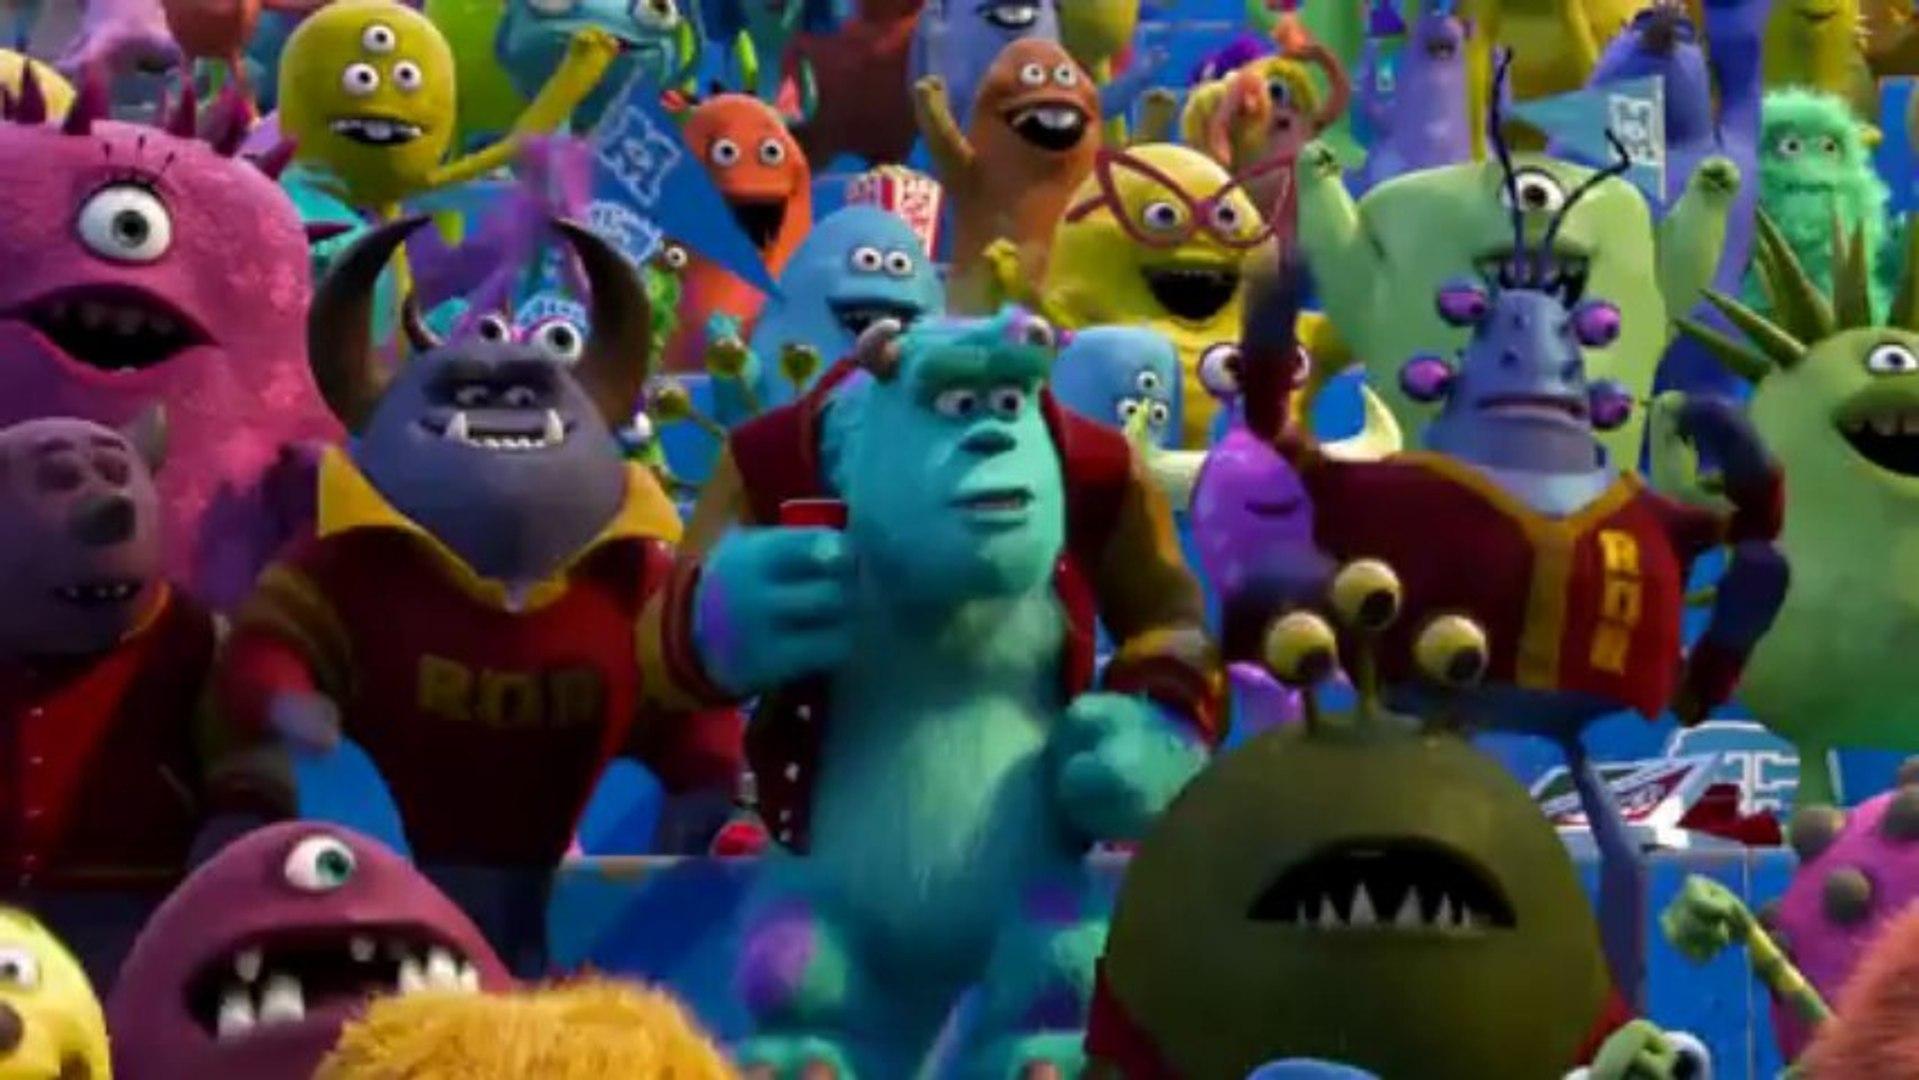 Monsters University Official Trailer #2 (2013) Monsters Inc Prequel Pixar Movie HD -  [720p]